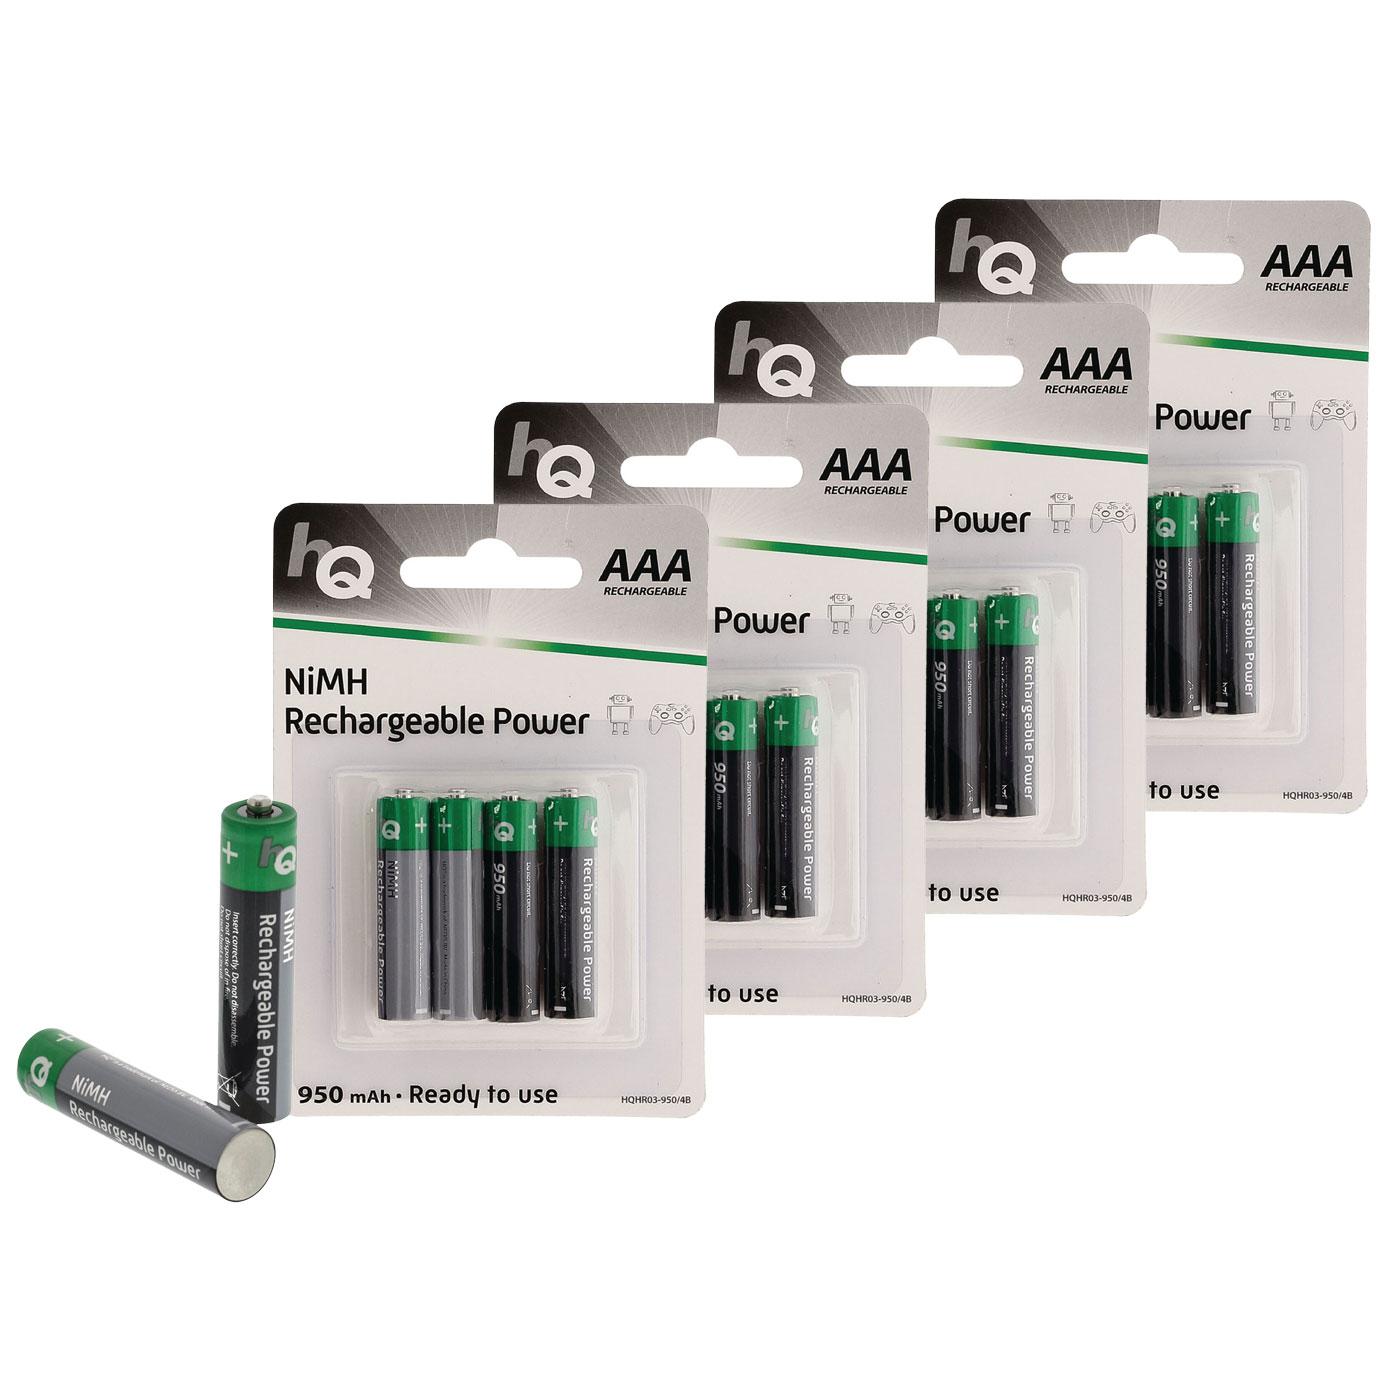 hq rechargeable power aaa 950 mah par 16 pile. Black Bedroom Furniture Sets. Home Design Ideas